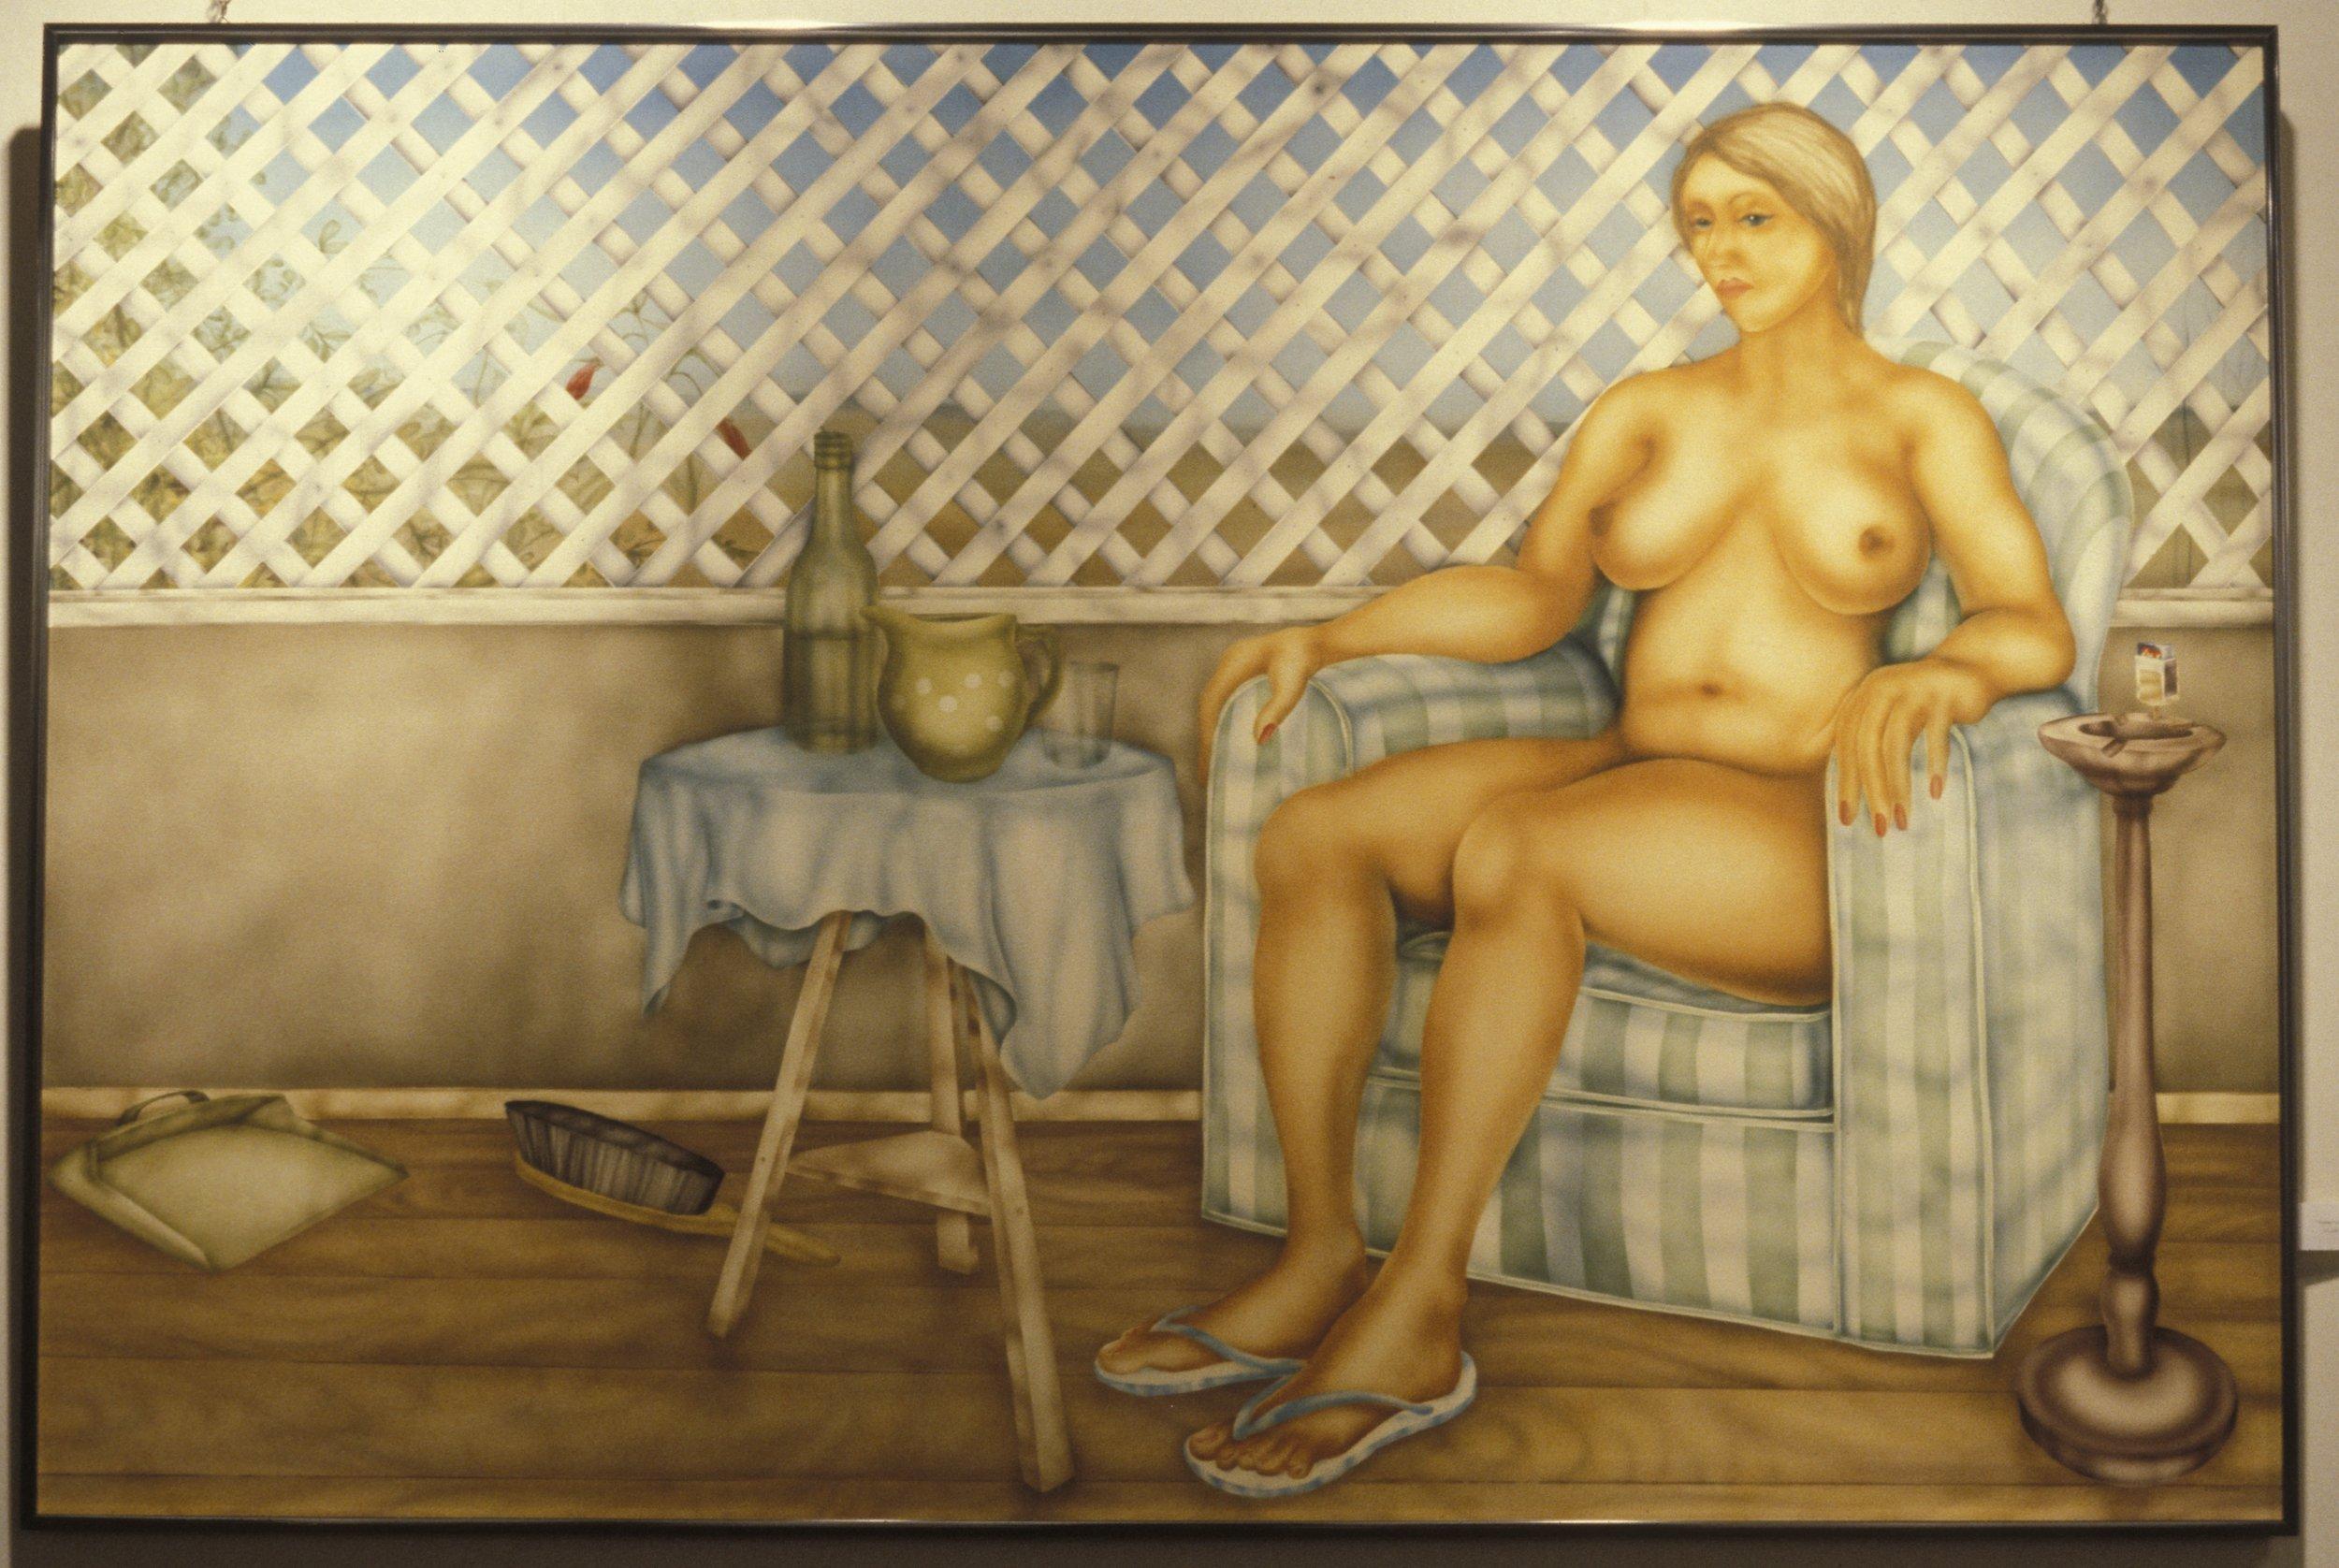 Farmer's Wif e 1983 enamel on marine wood c 120 x 170 cm  (private collection Brisbane)